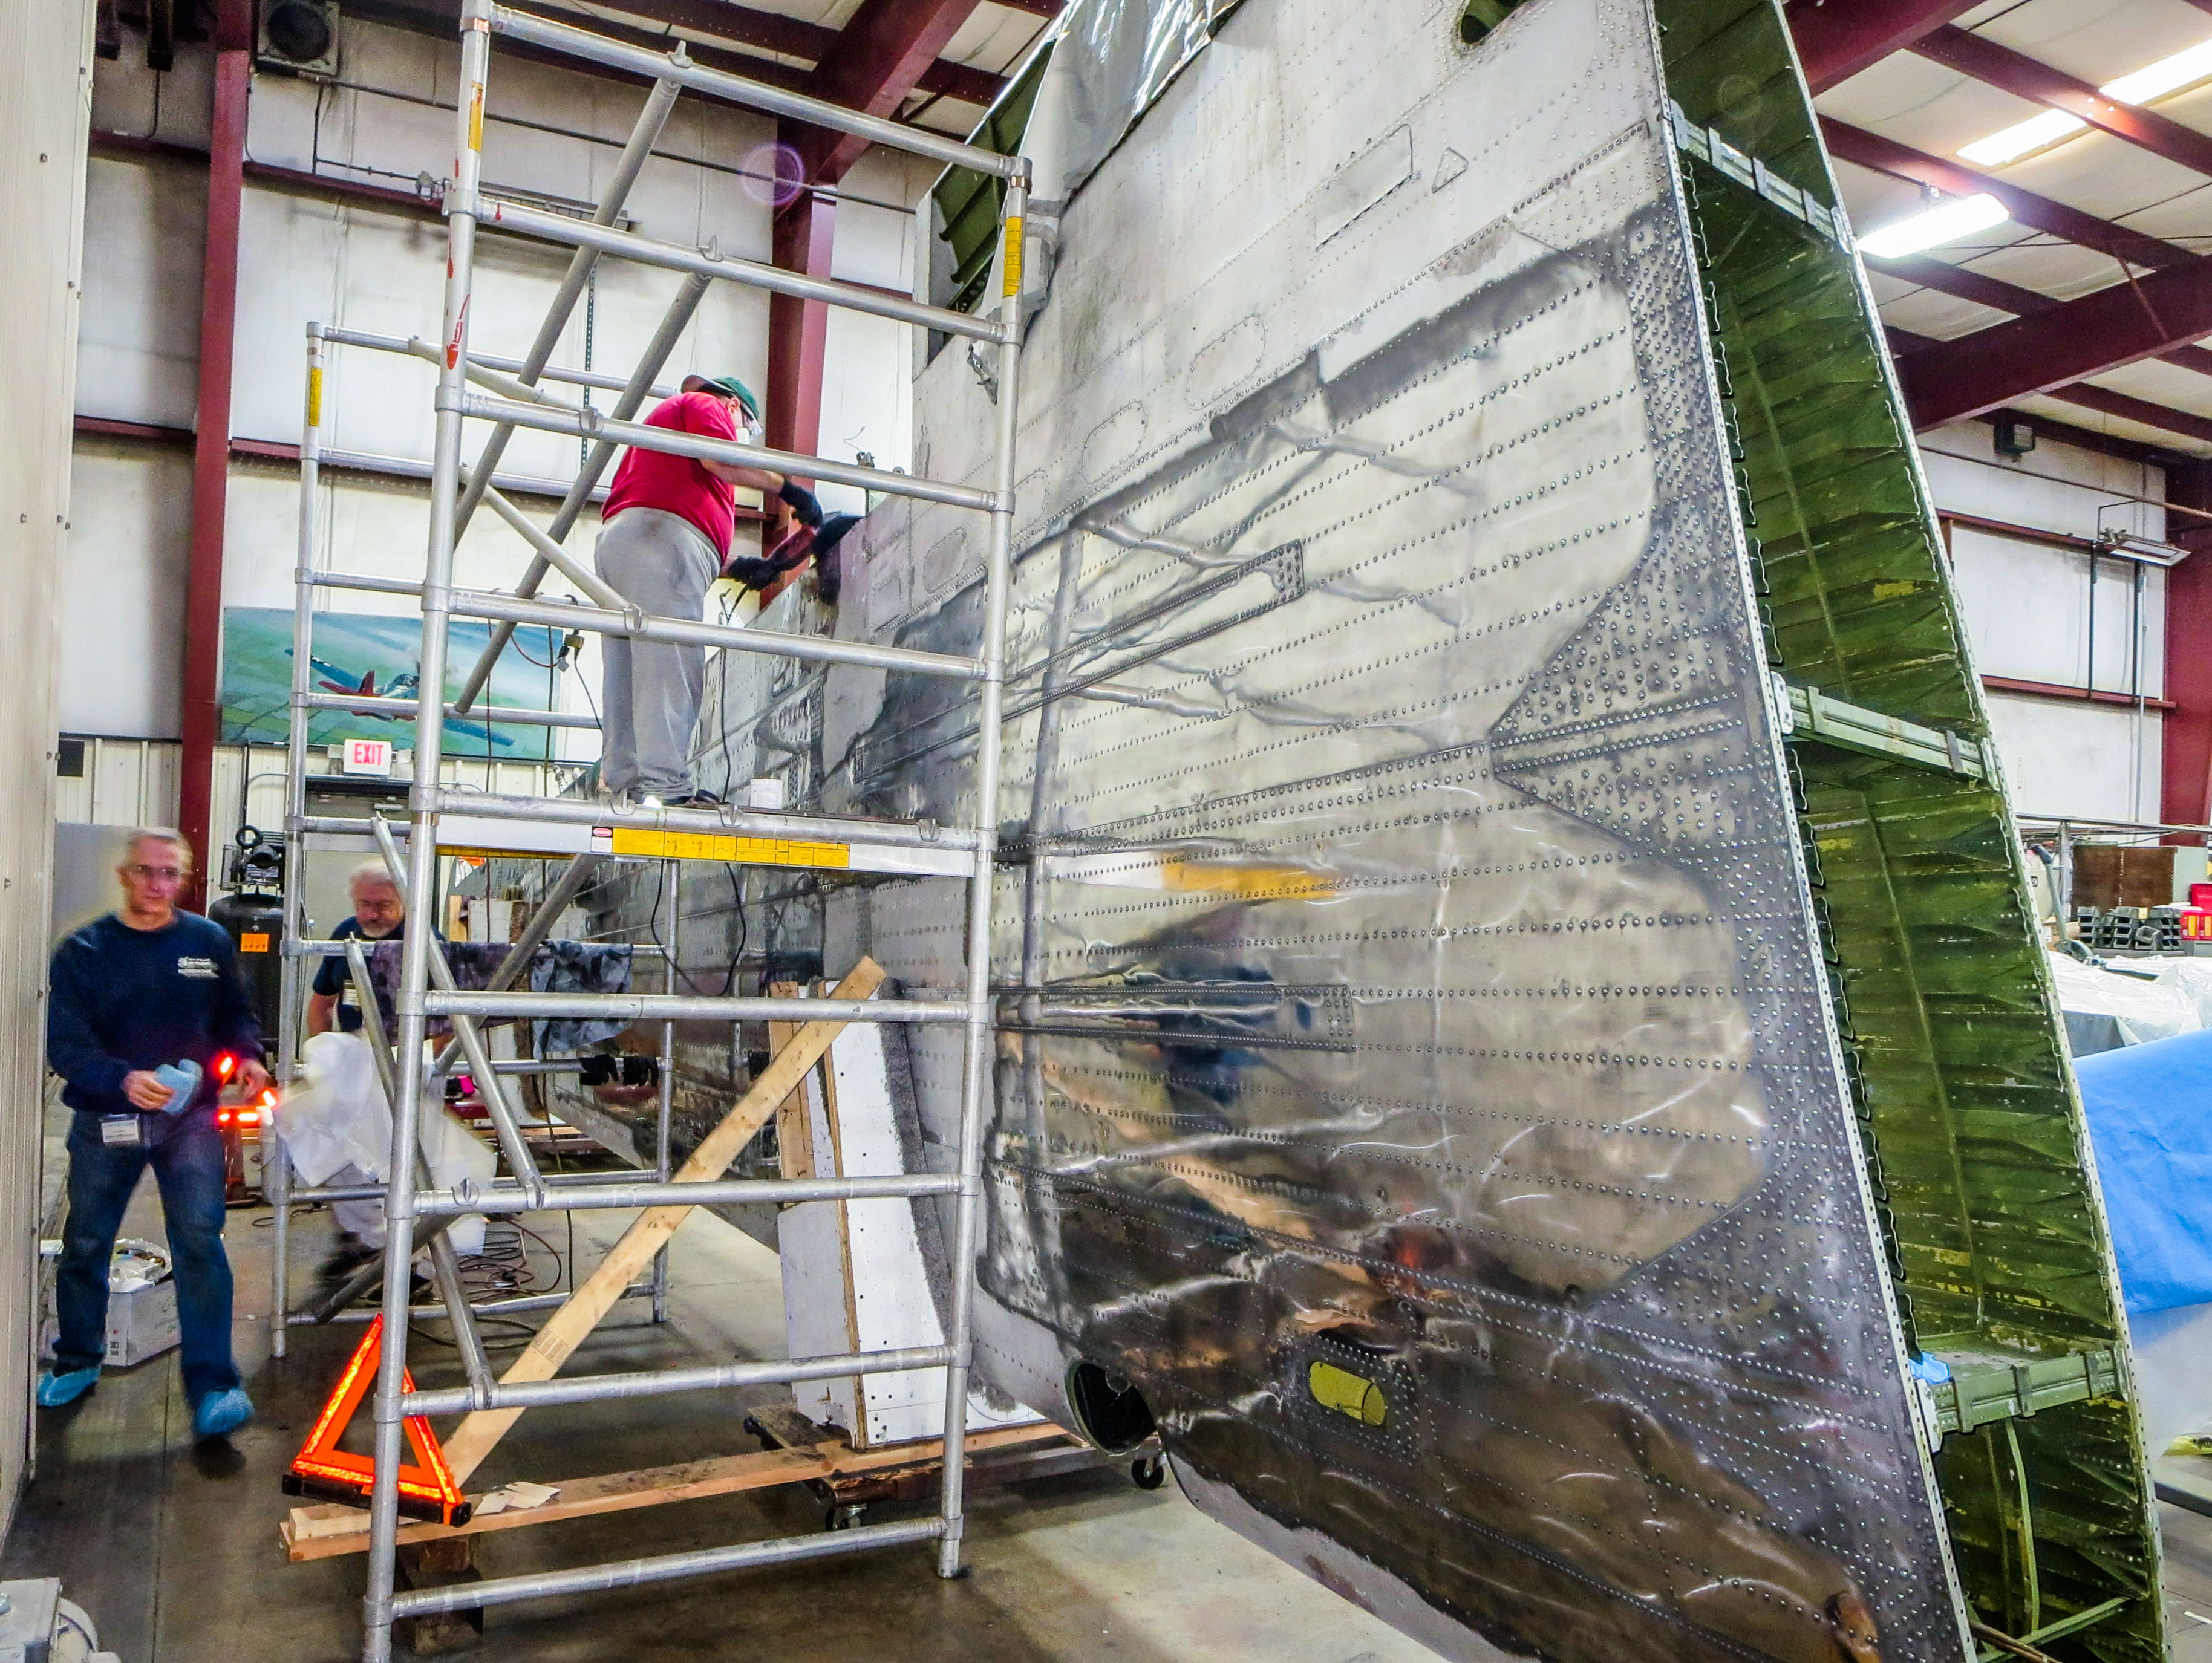 Members of the restoration team soon got to work polishing the left wing. (photo via NEAM)